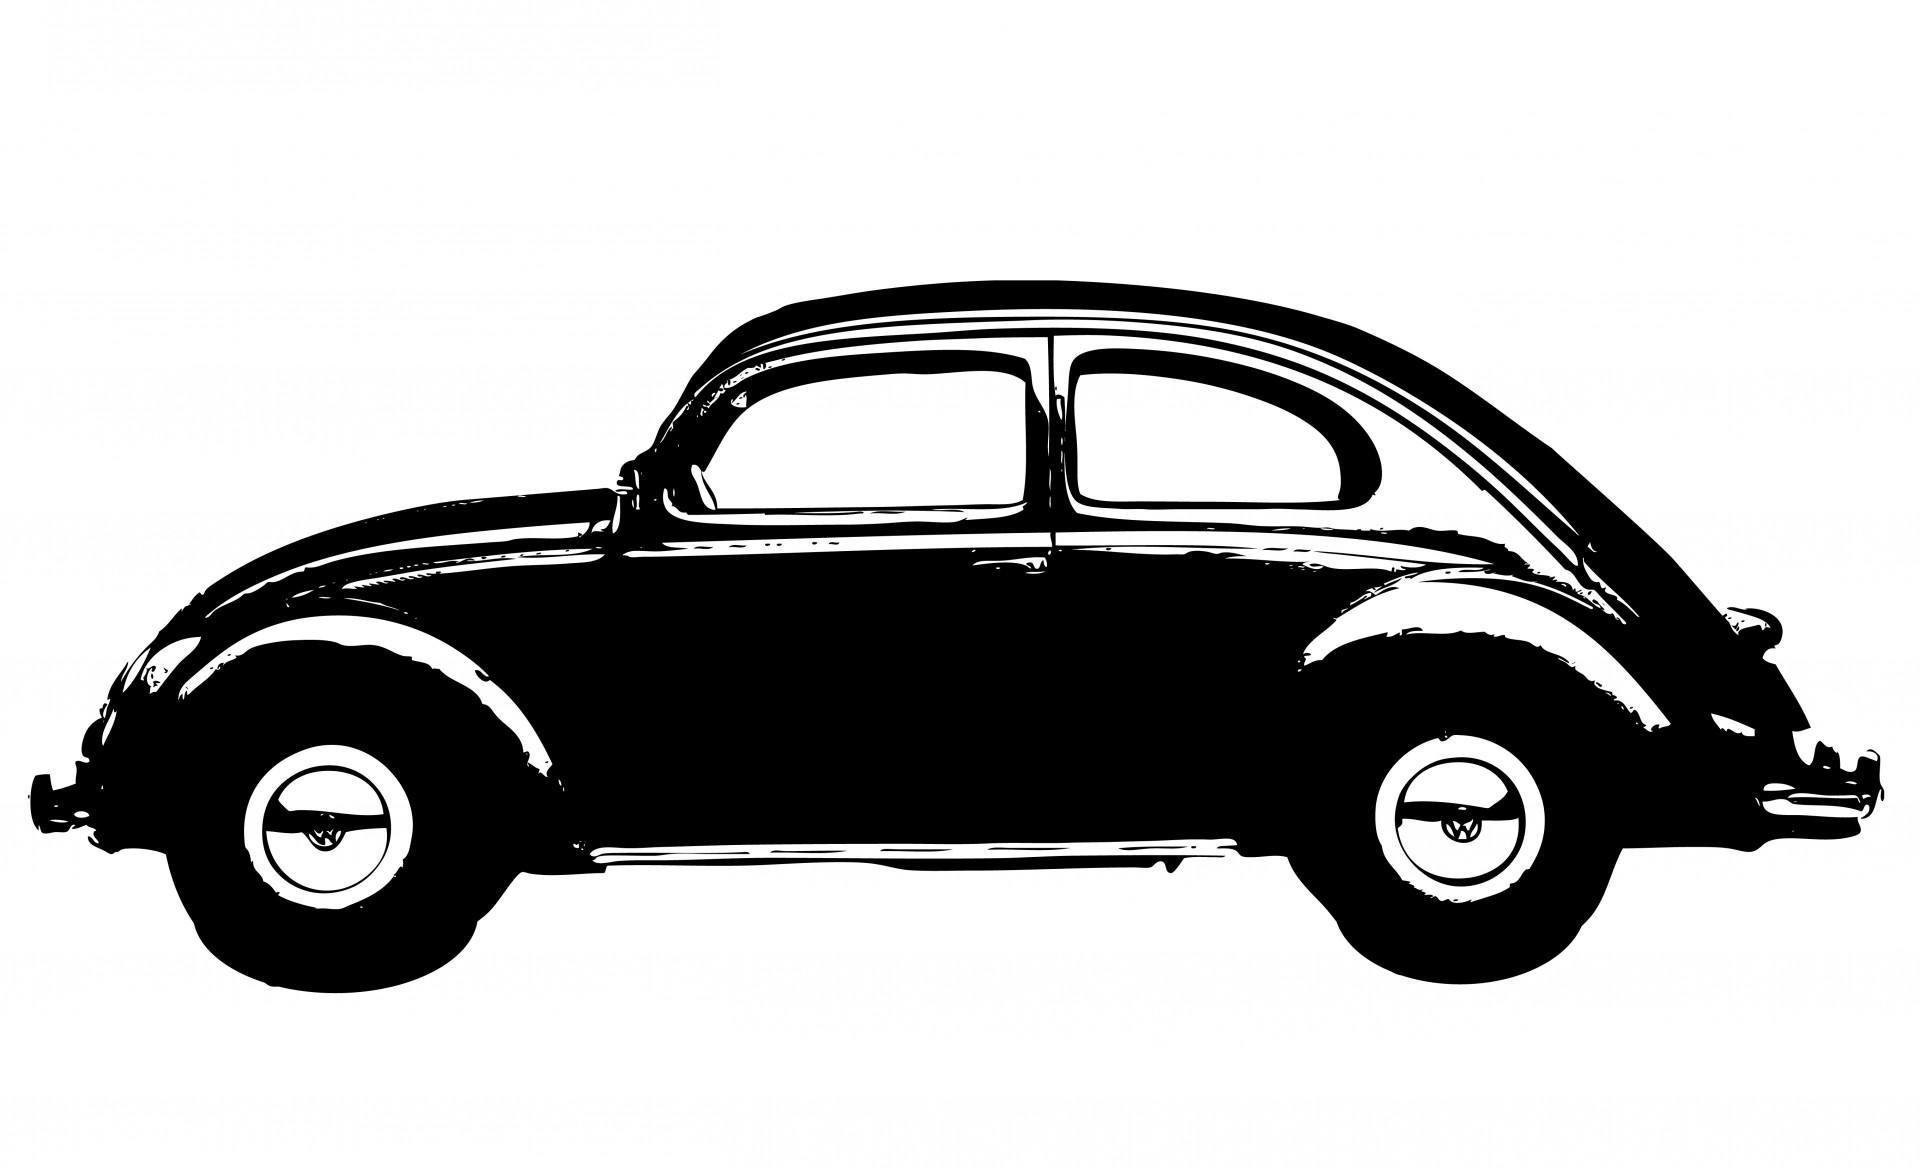 Vintage Car Black Clipart-Vintage Car Black Clipart-12